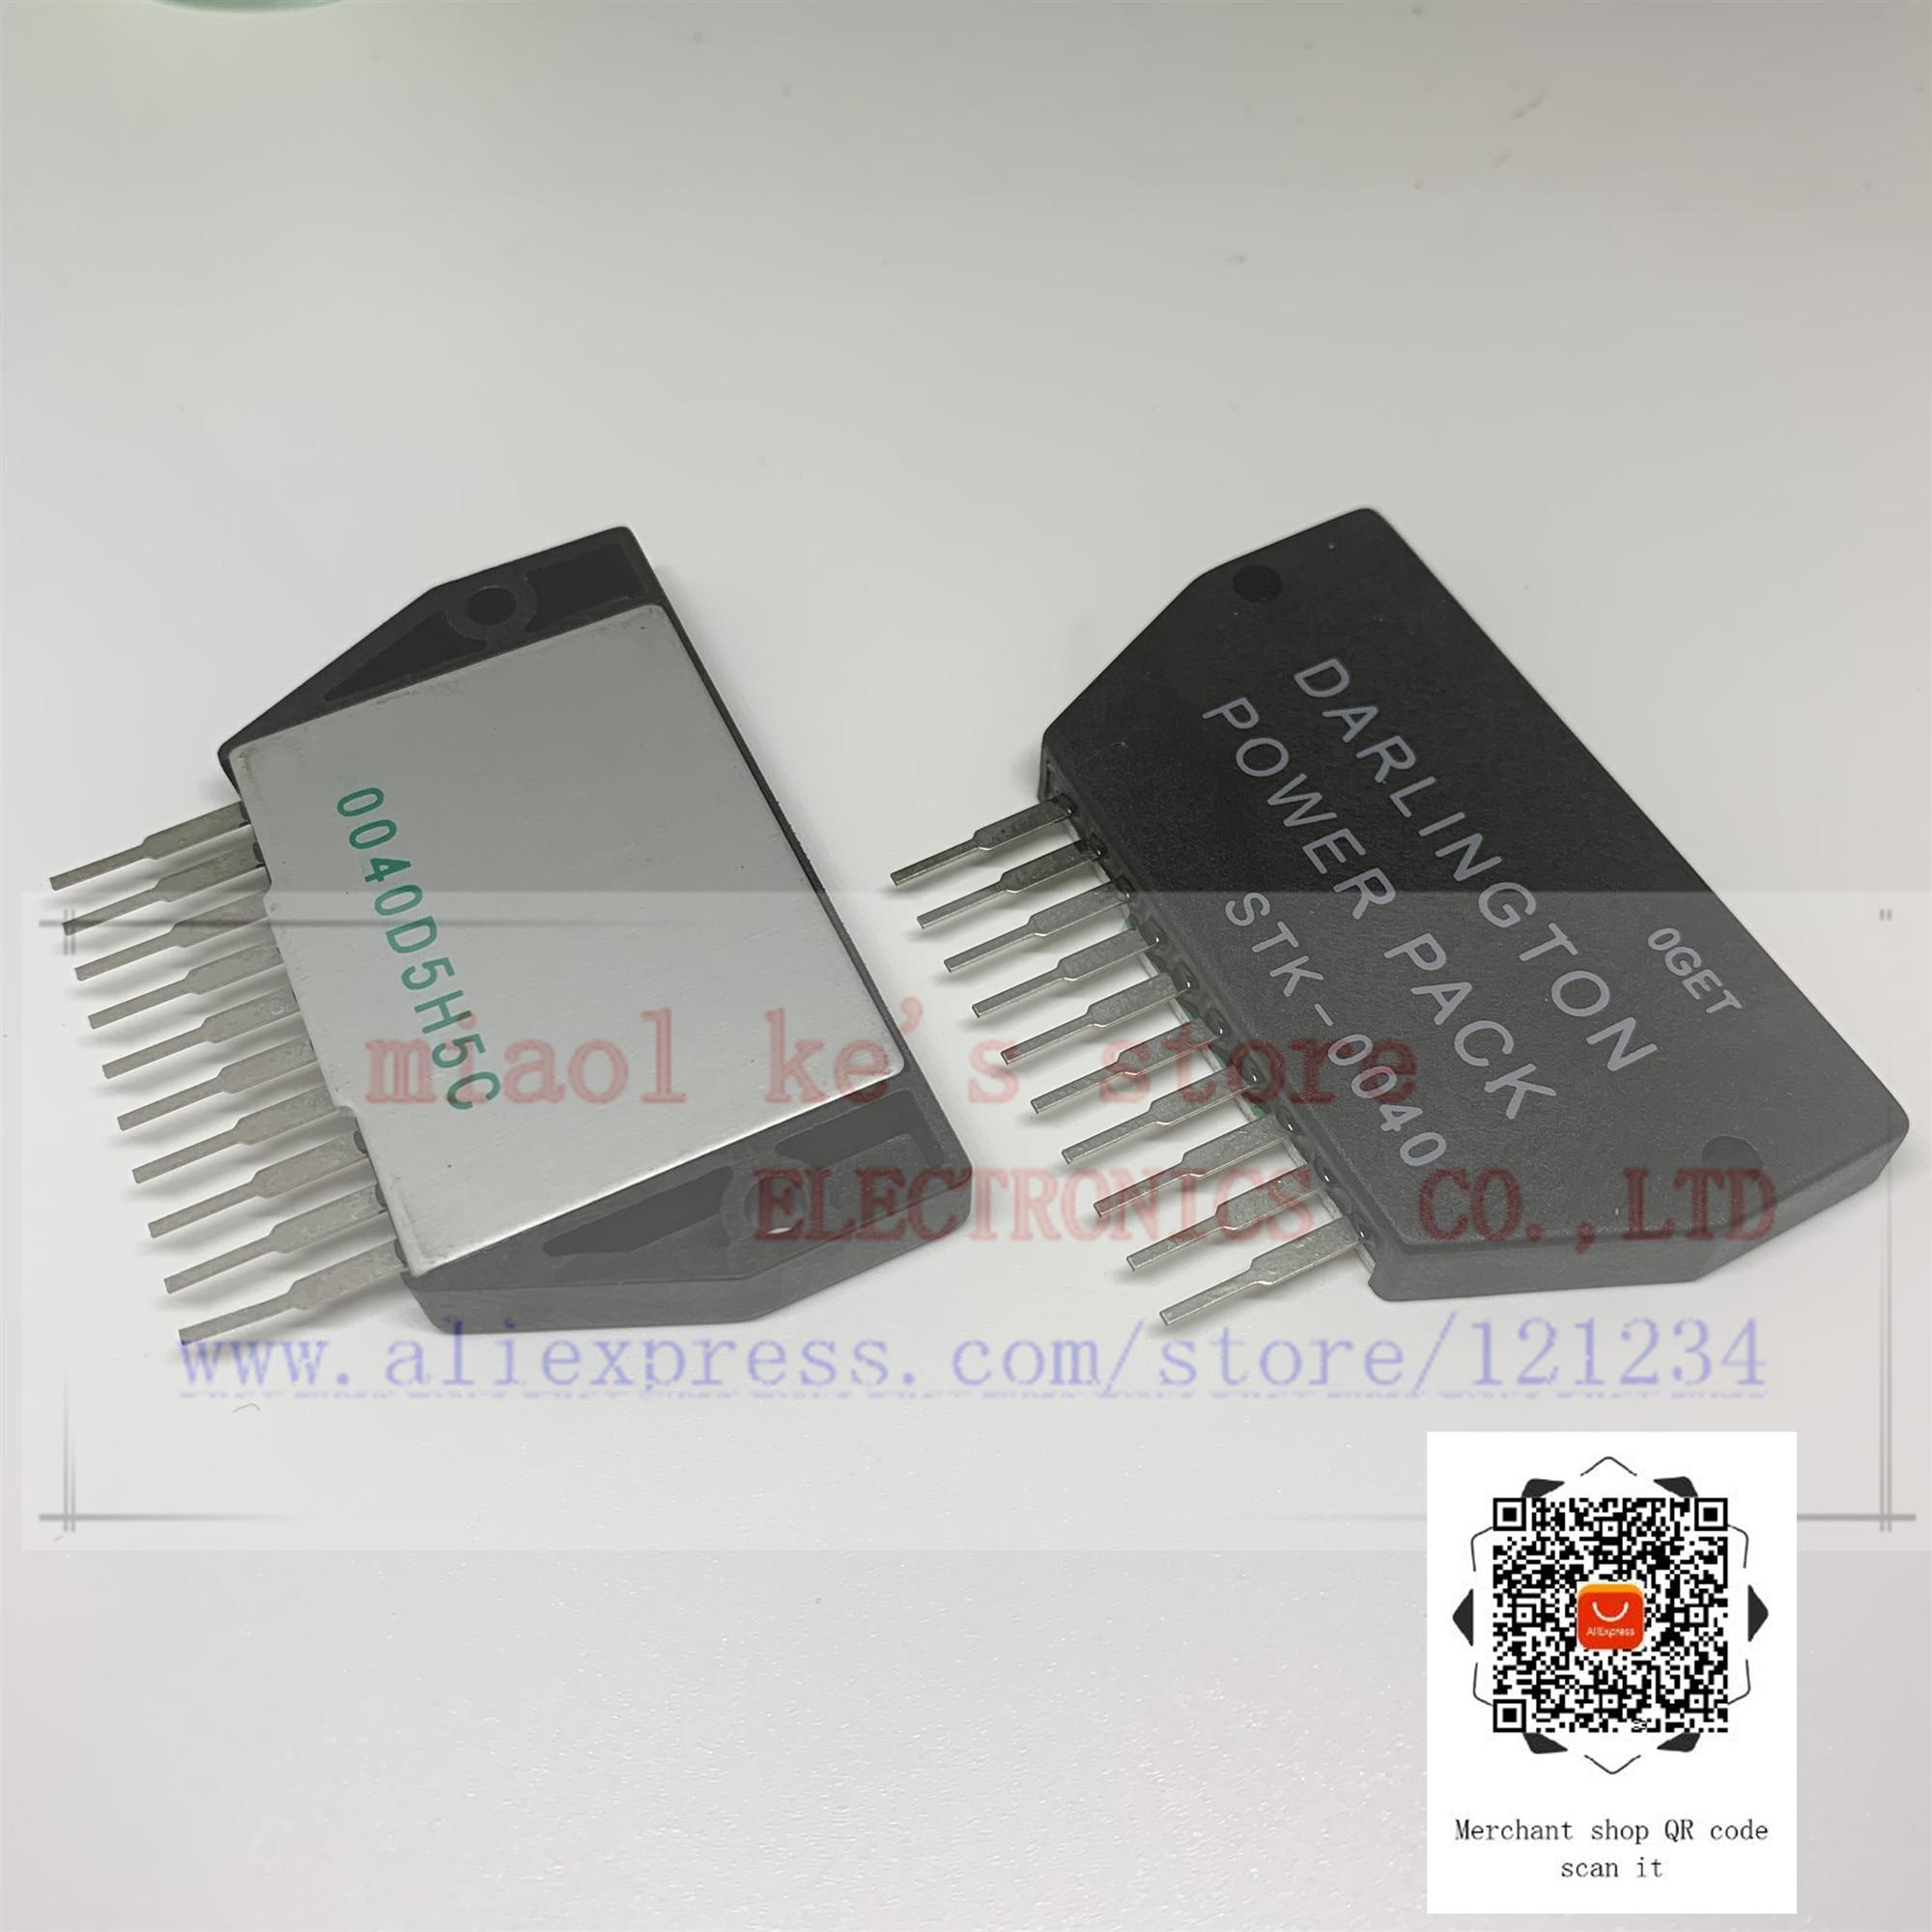 100%New Original; STK-0040 STK0040 ZIP10 - OUTPUT STAGE OF AF POWER AMP